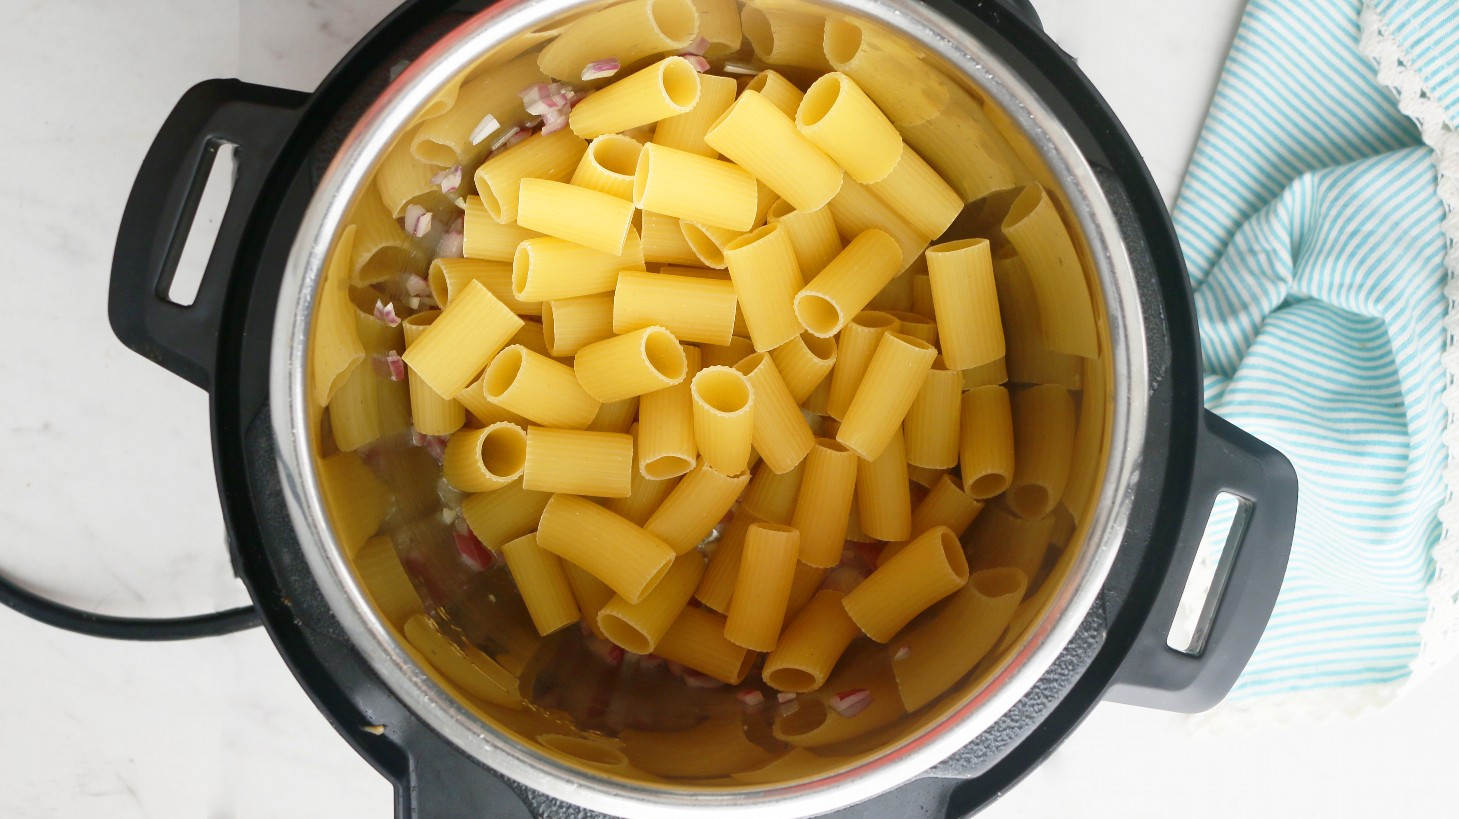 Ziti horneado sin carne en una olla instantánea